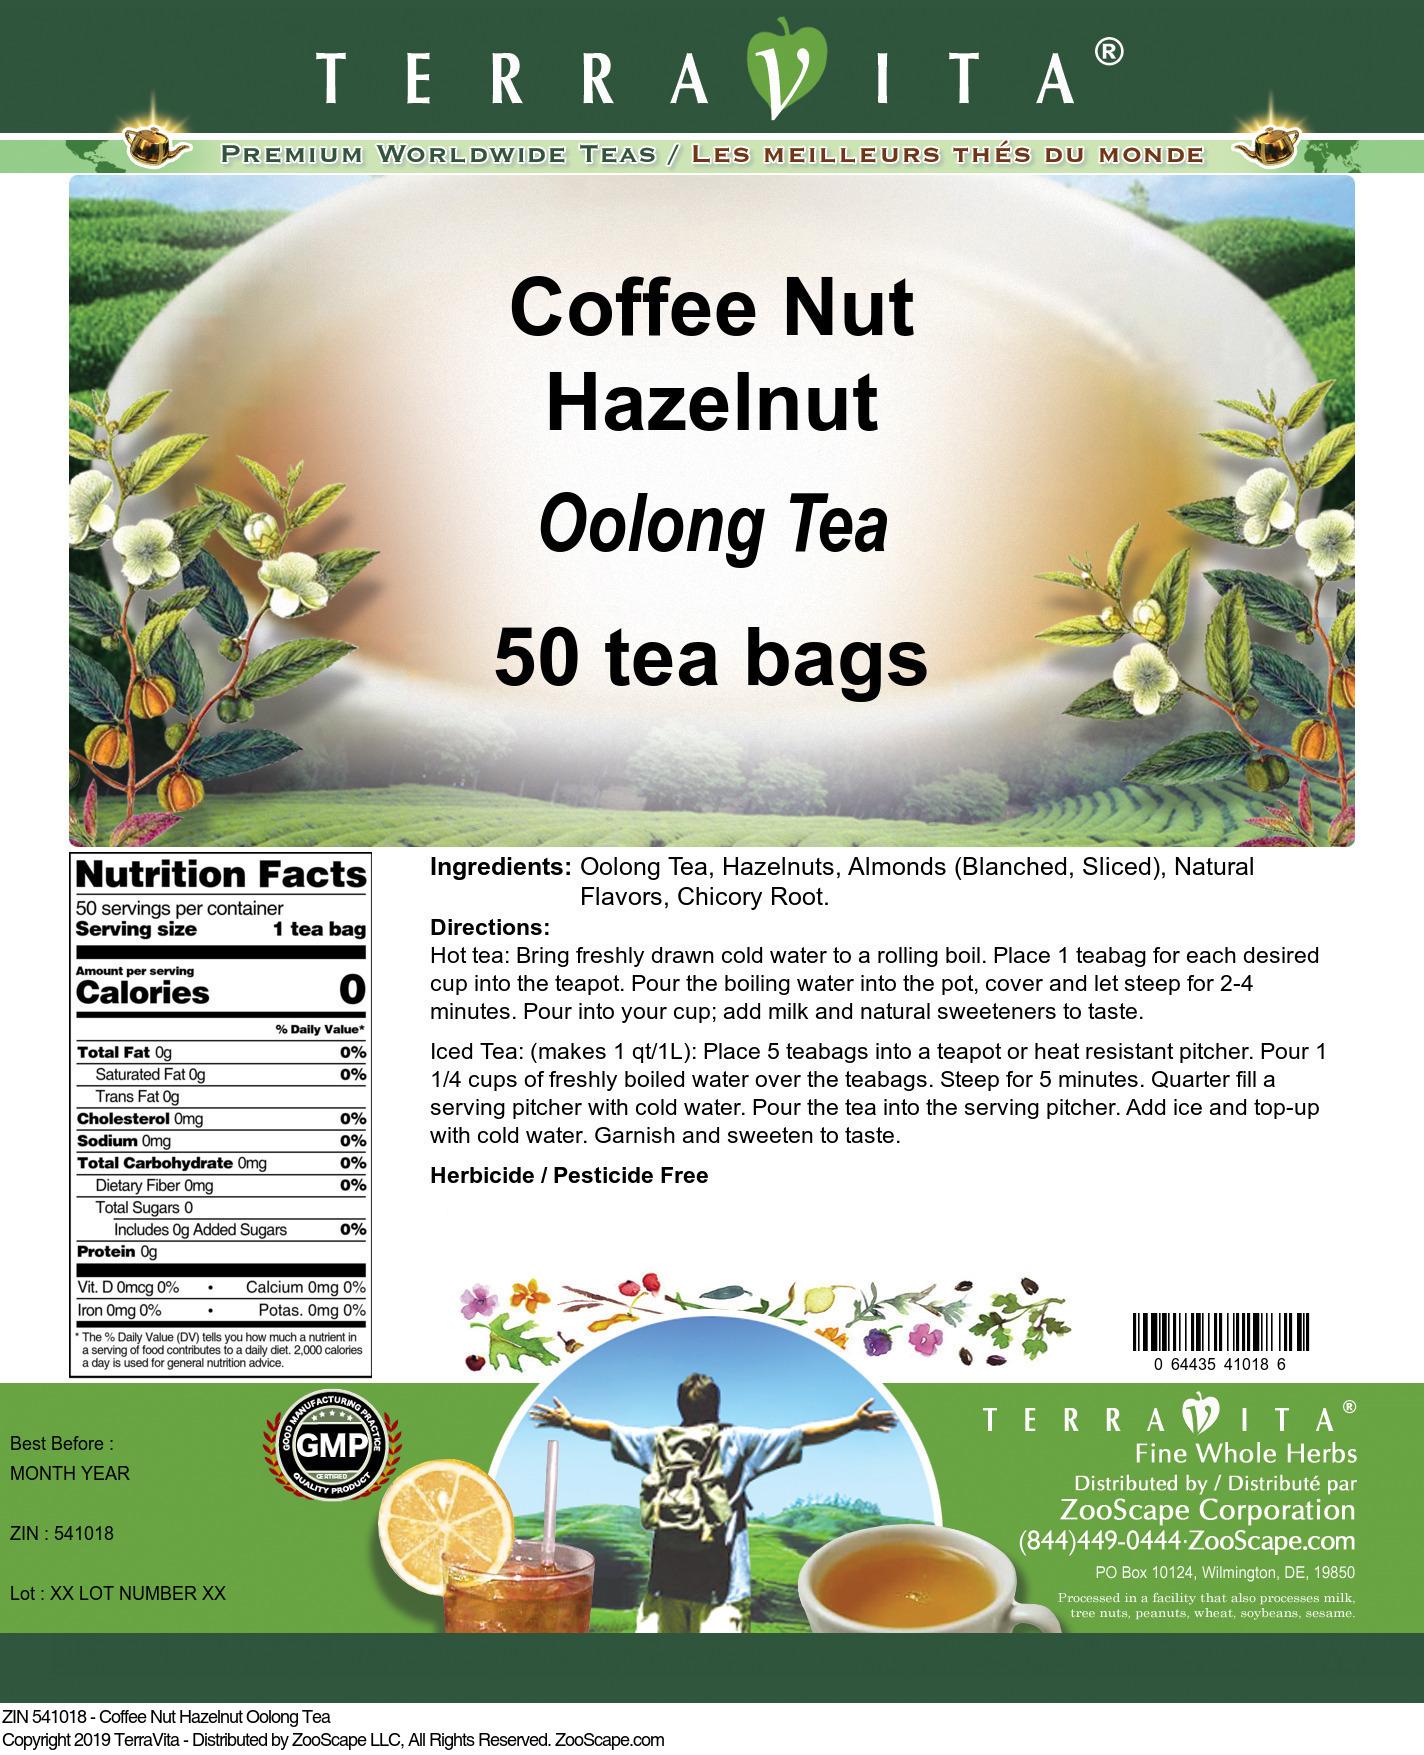 Coffee Nut Hazelnut Oolong Tea